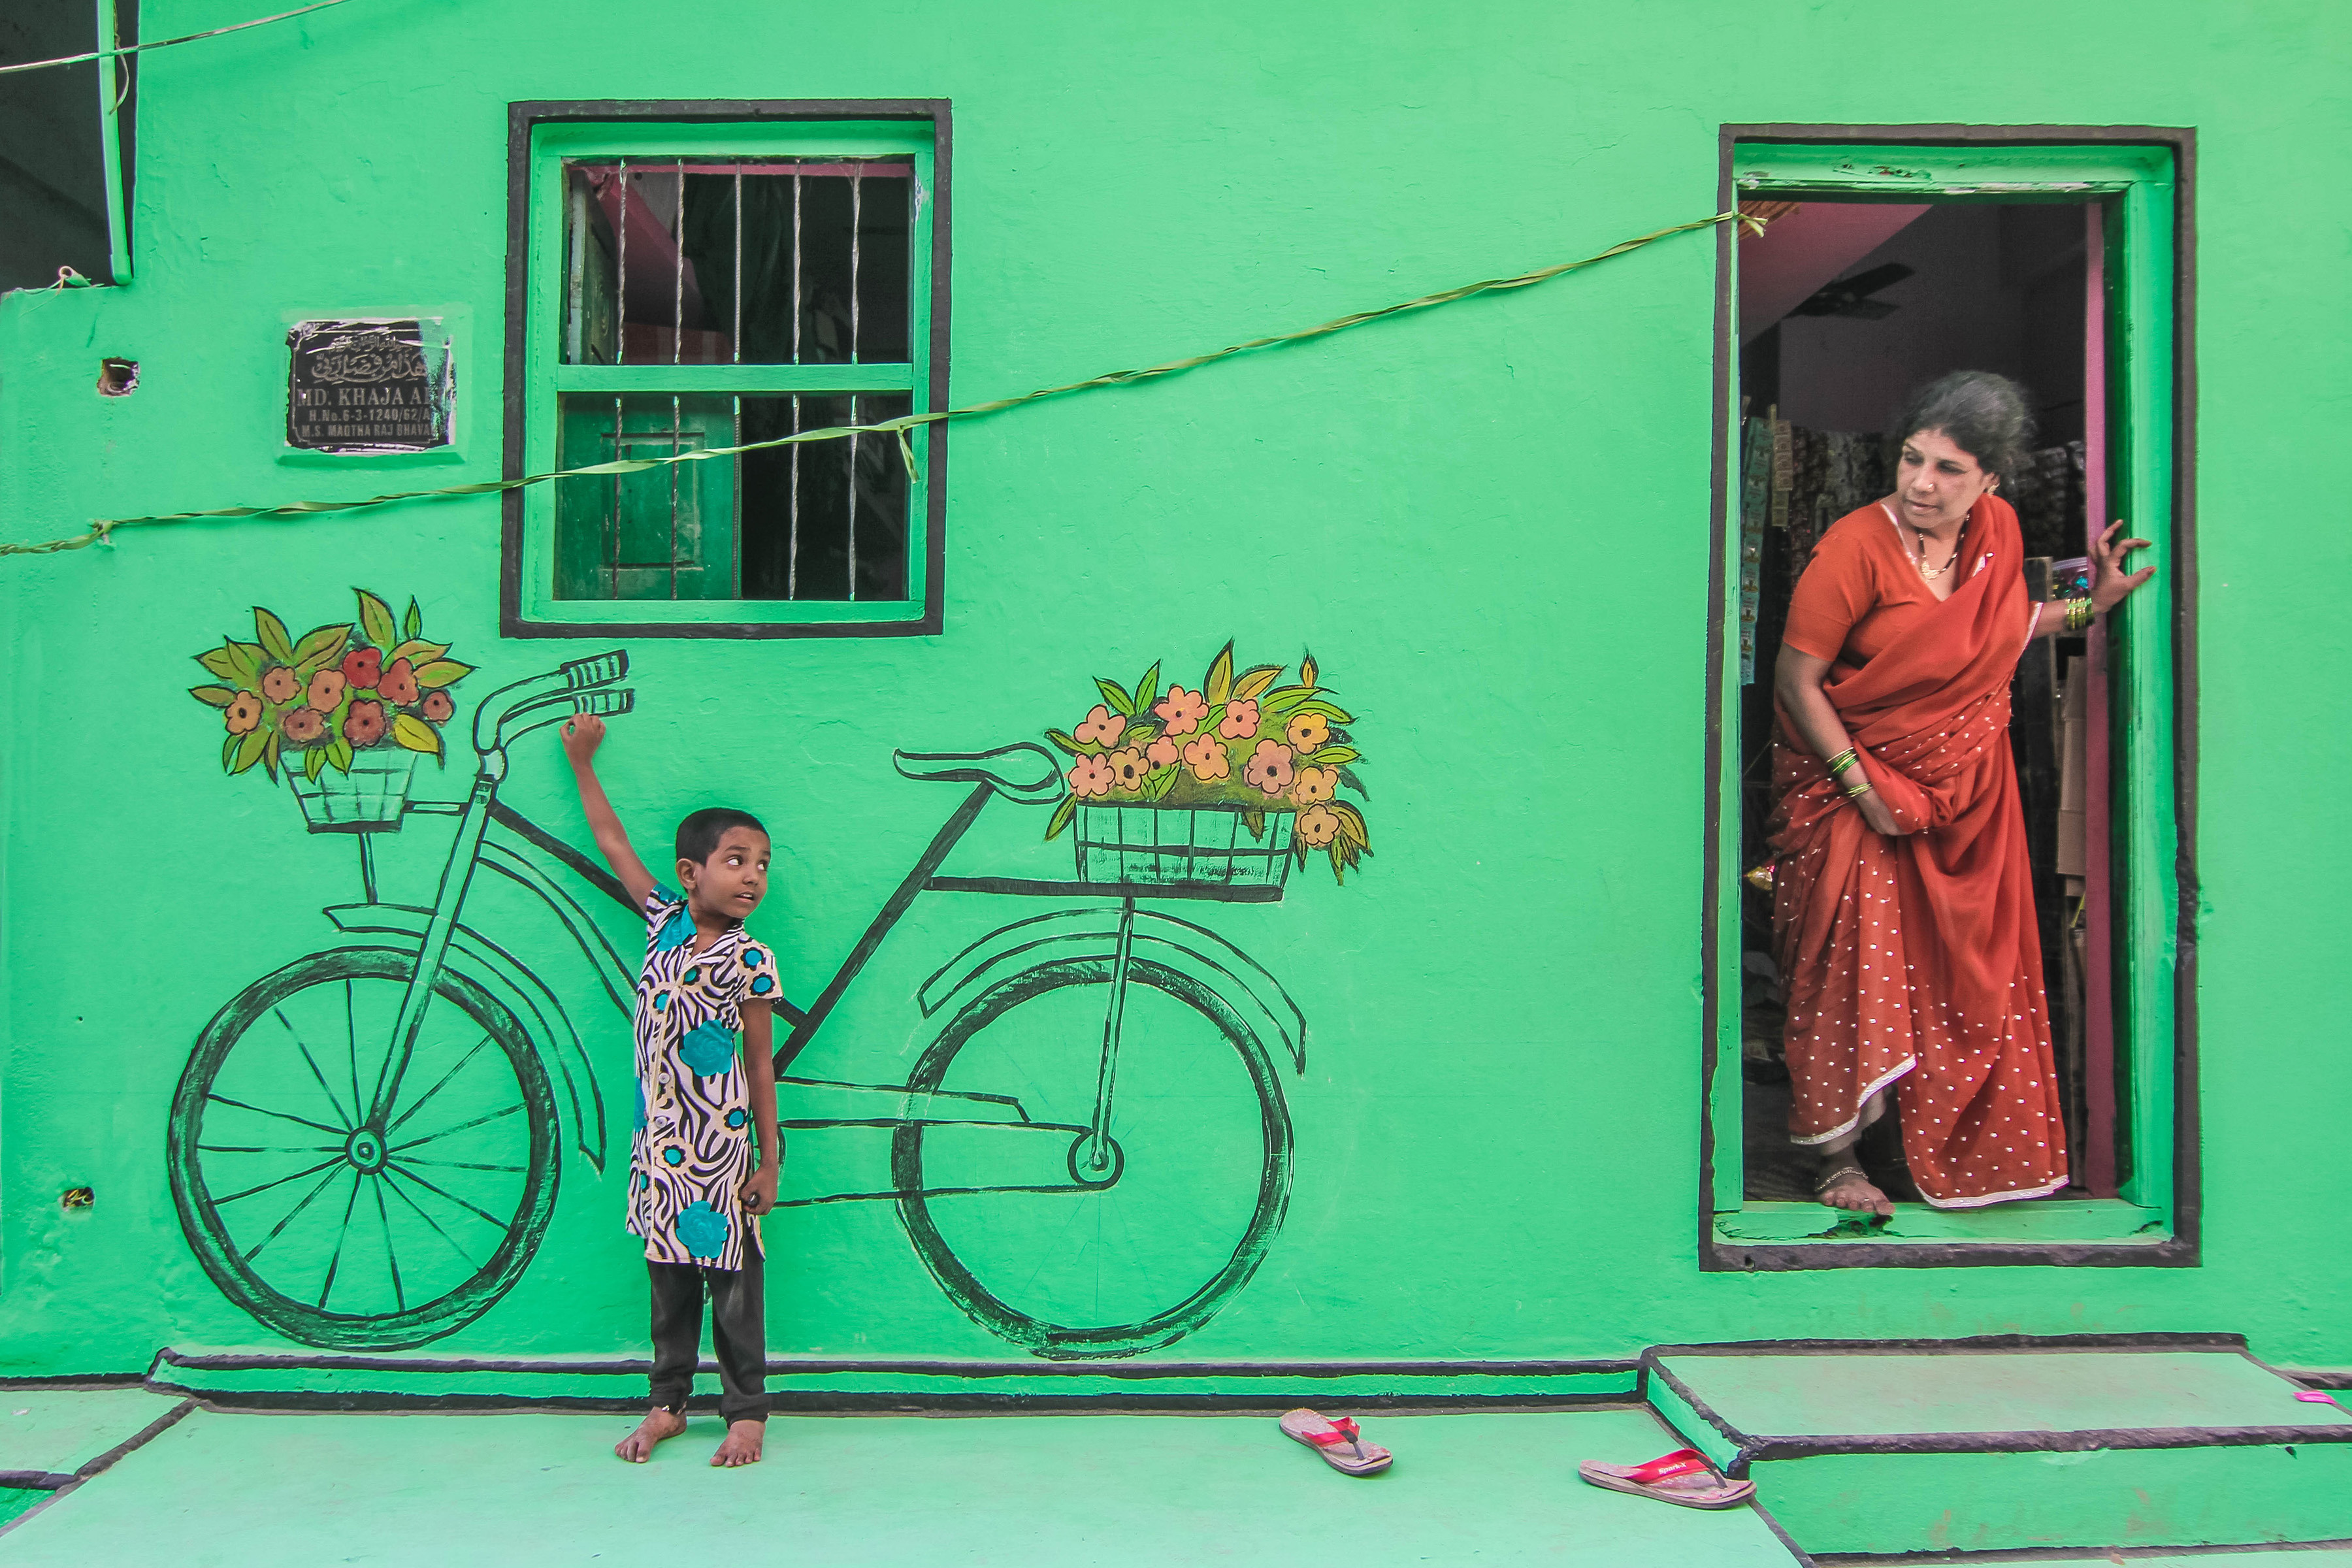 Hoozinc Green Gully Maqta Art District2017 Pranav Gohil